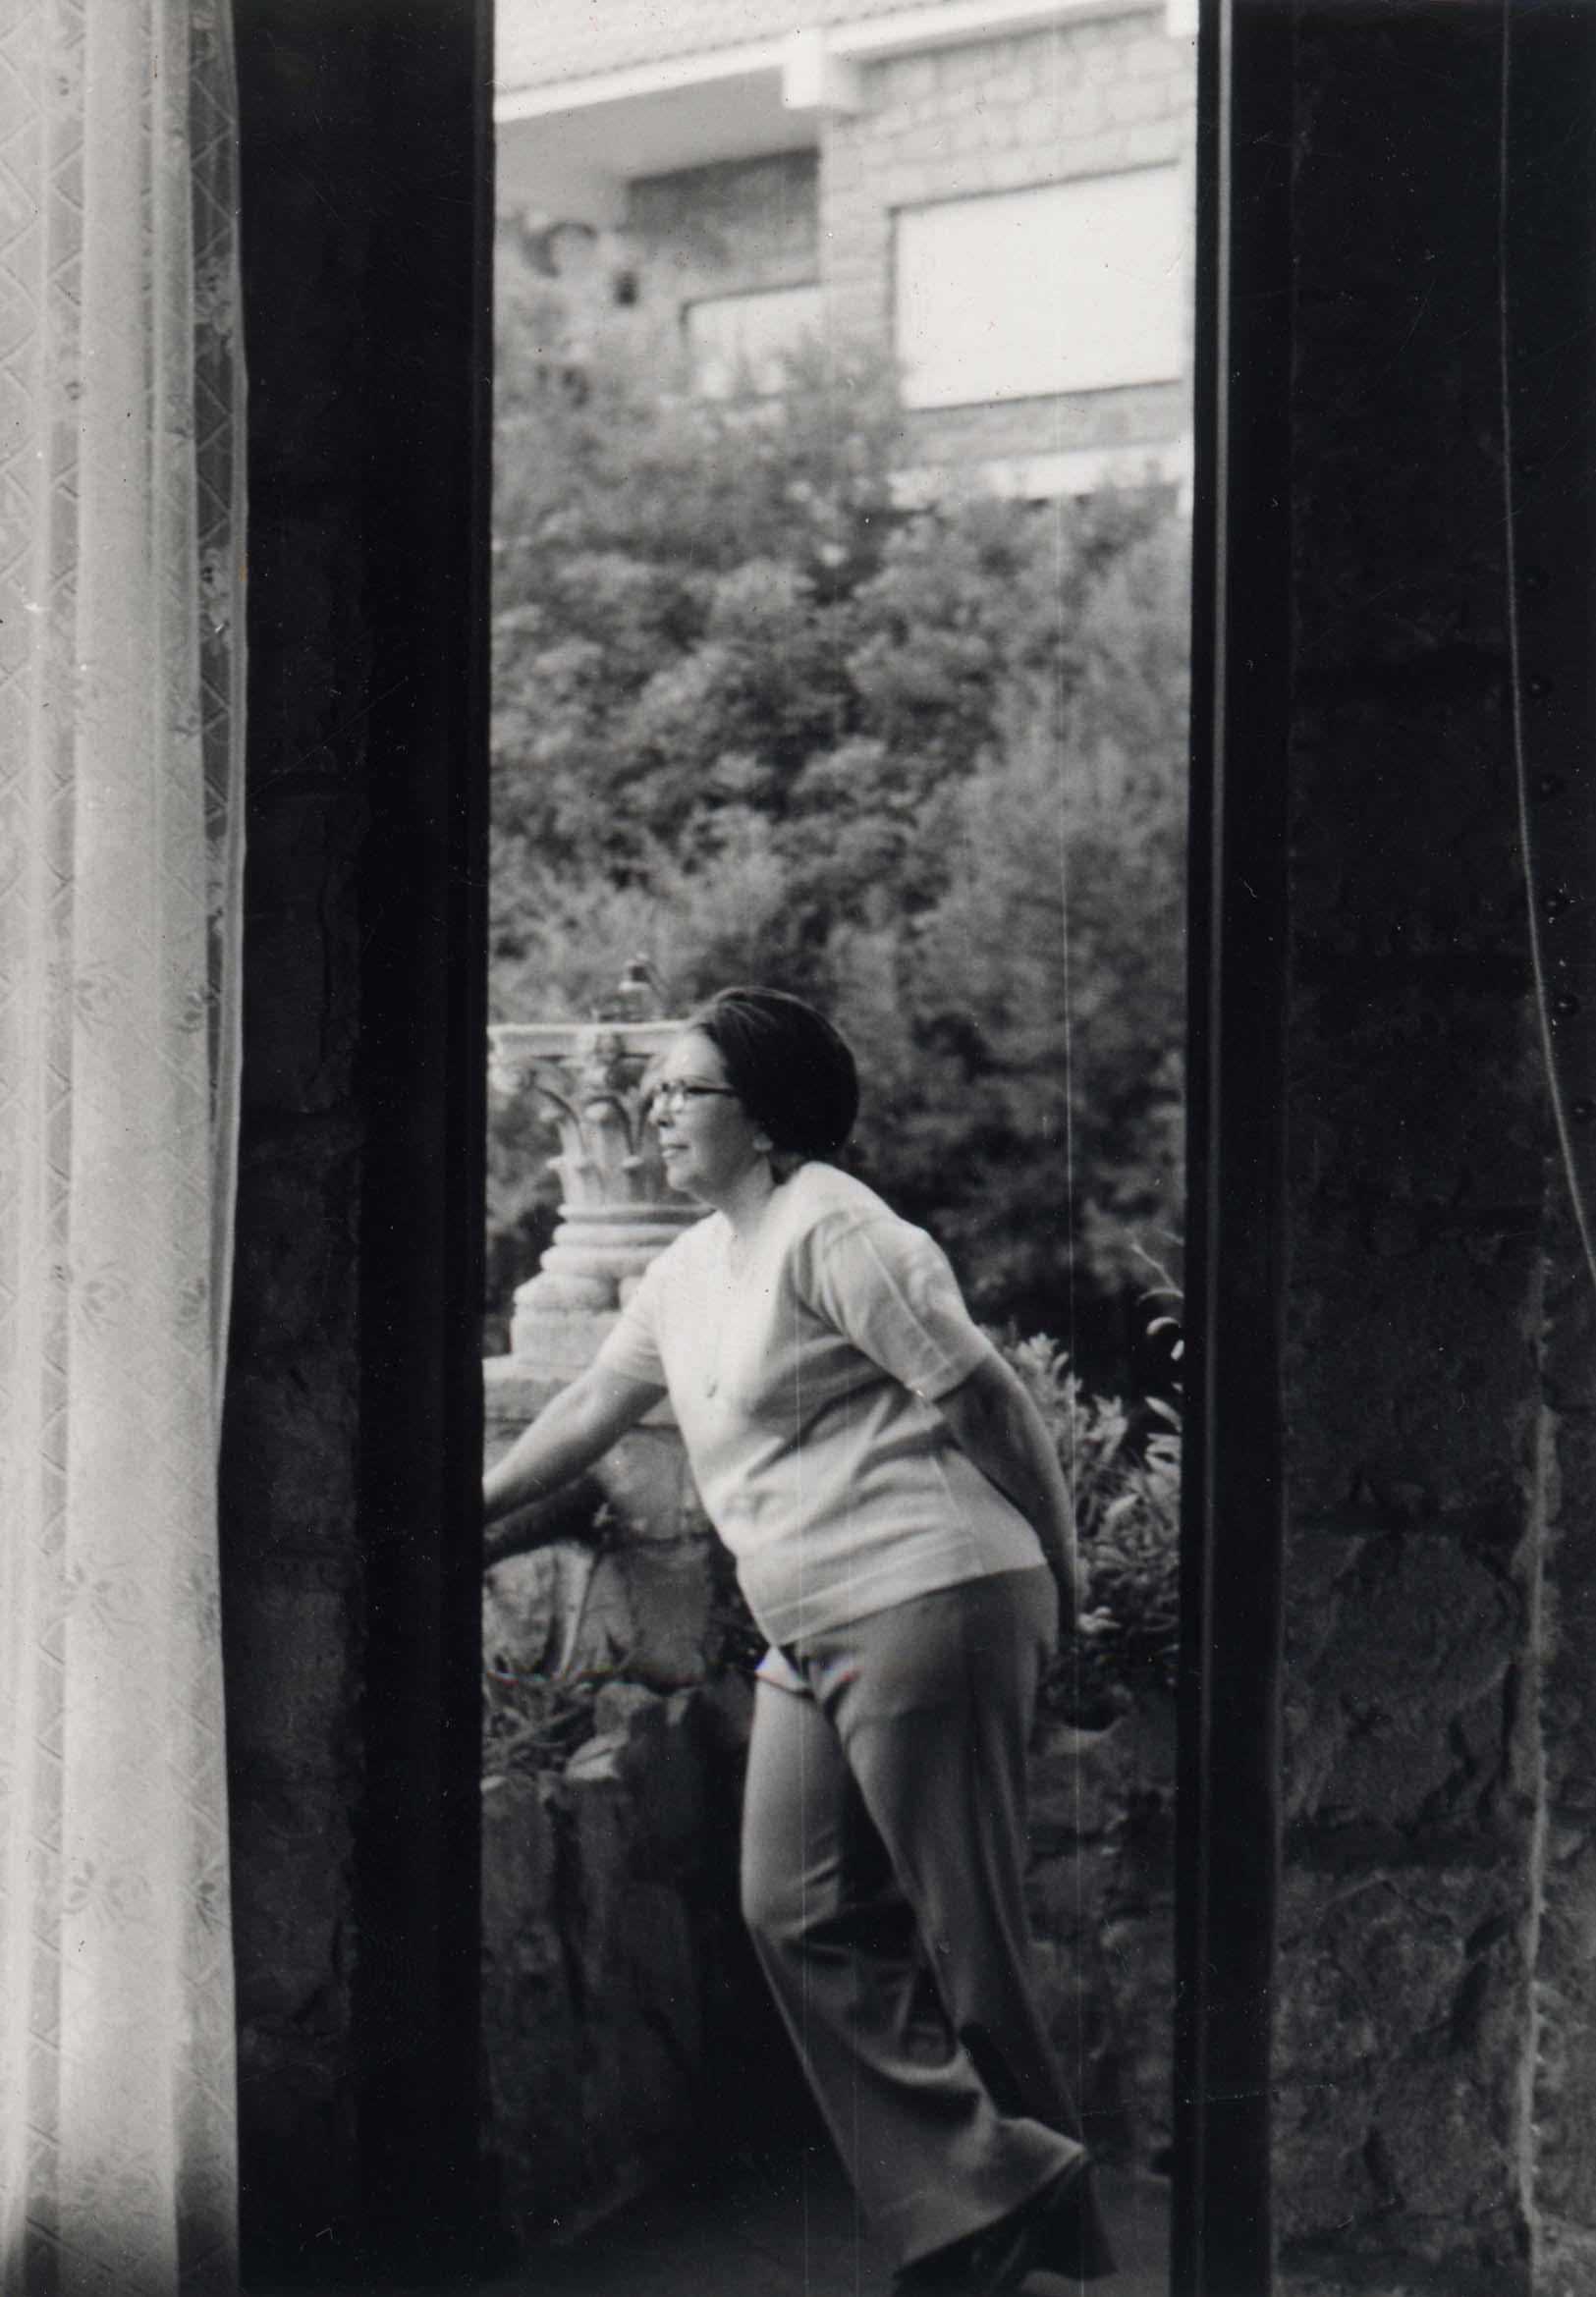 Autorretrato (1973) - Belkiss Adrover de Cibrán